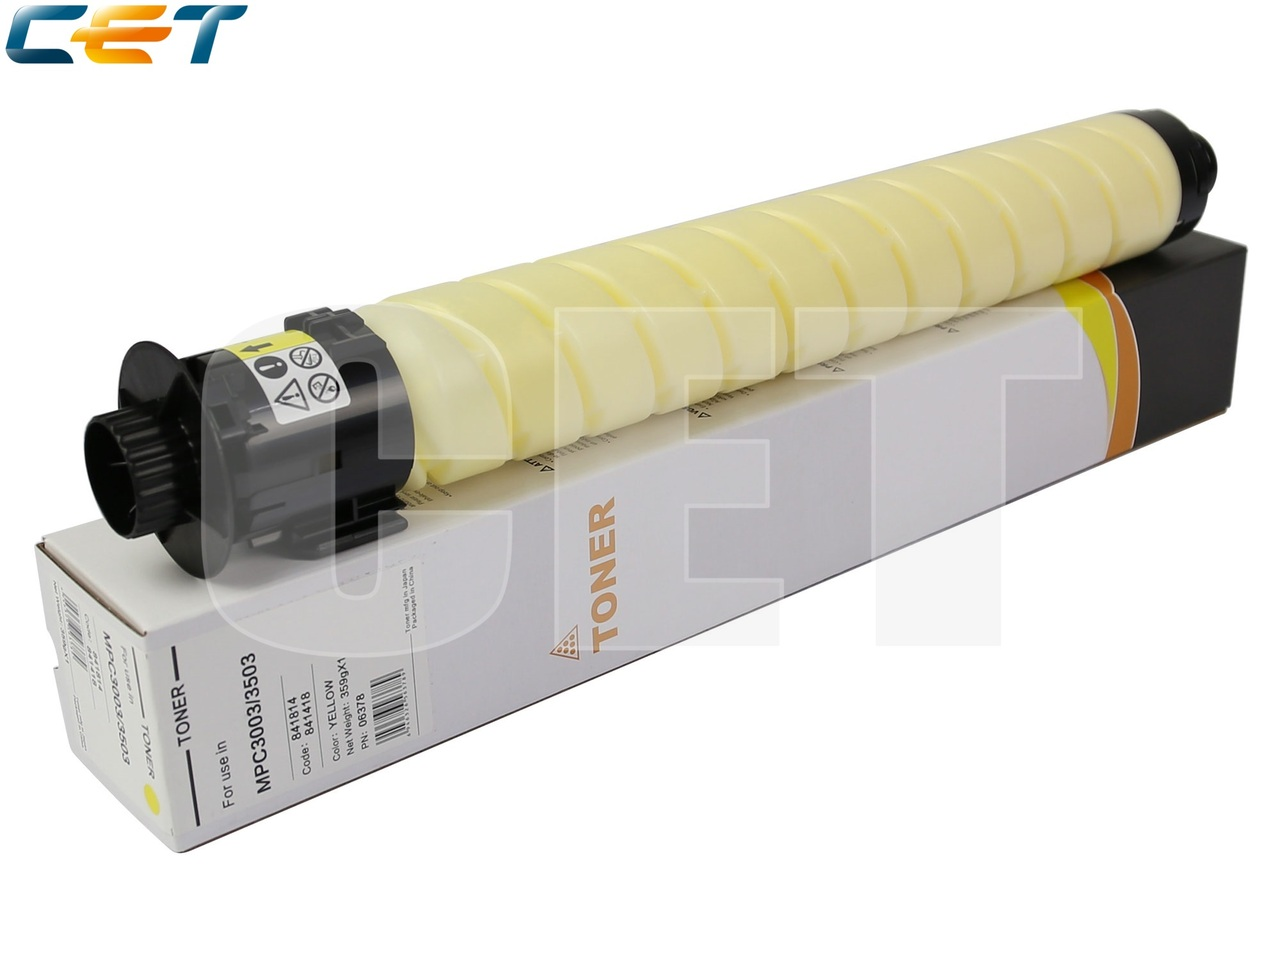 Тонер-картридж 841818 для RICOHMPC3003/MPC3503/MPC3004/MPC3504 (CET) Yellow, 359г,18000 стр., CET6378